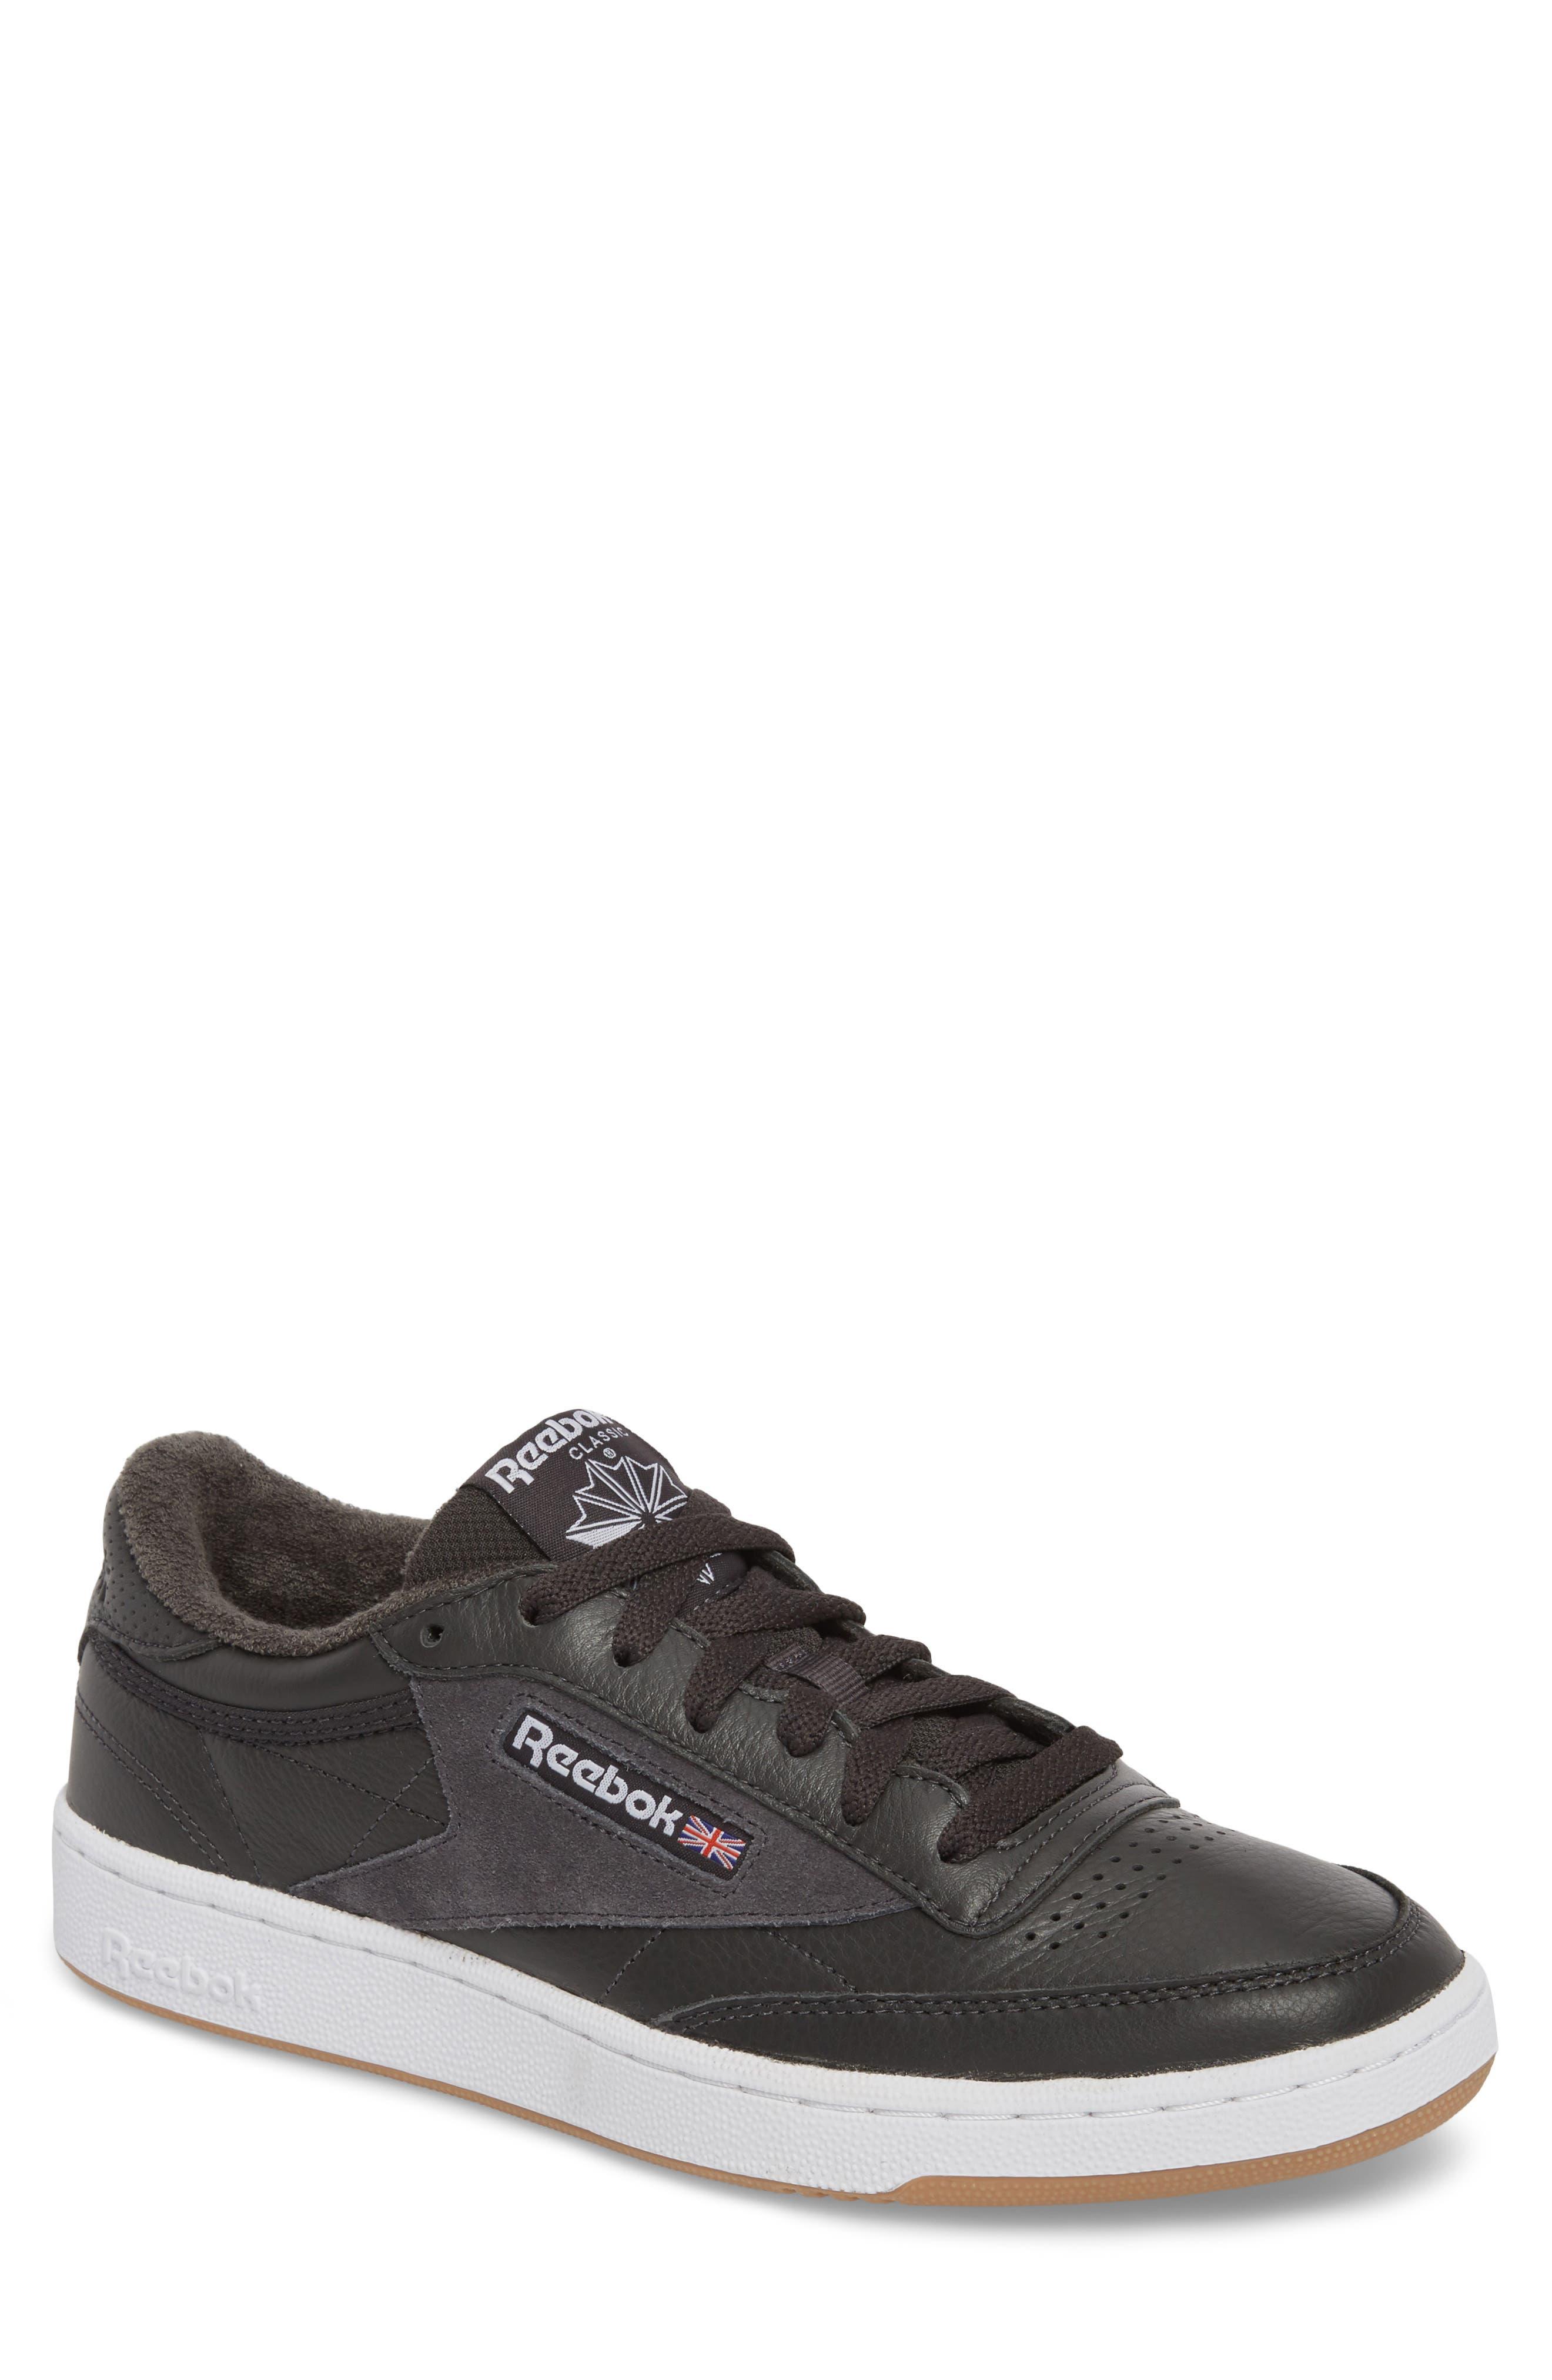 Club C 85 ESTL Sneaker,                             Main thumbnail 1, color,                             Coal/ White/ Washed Blue